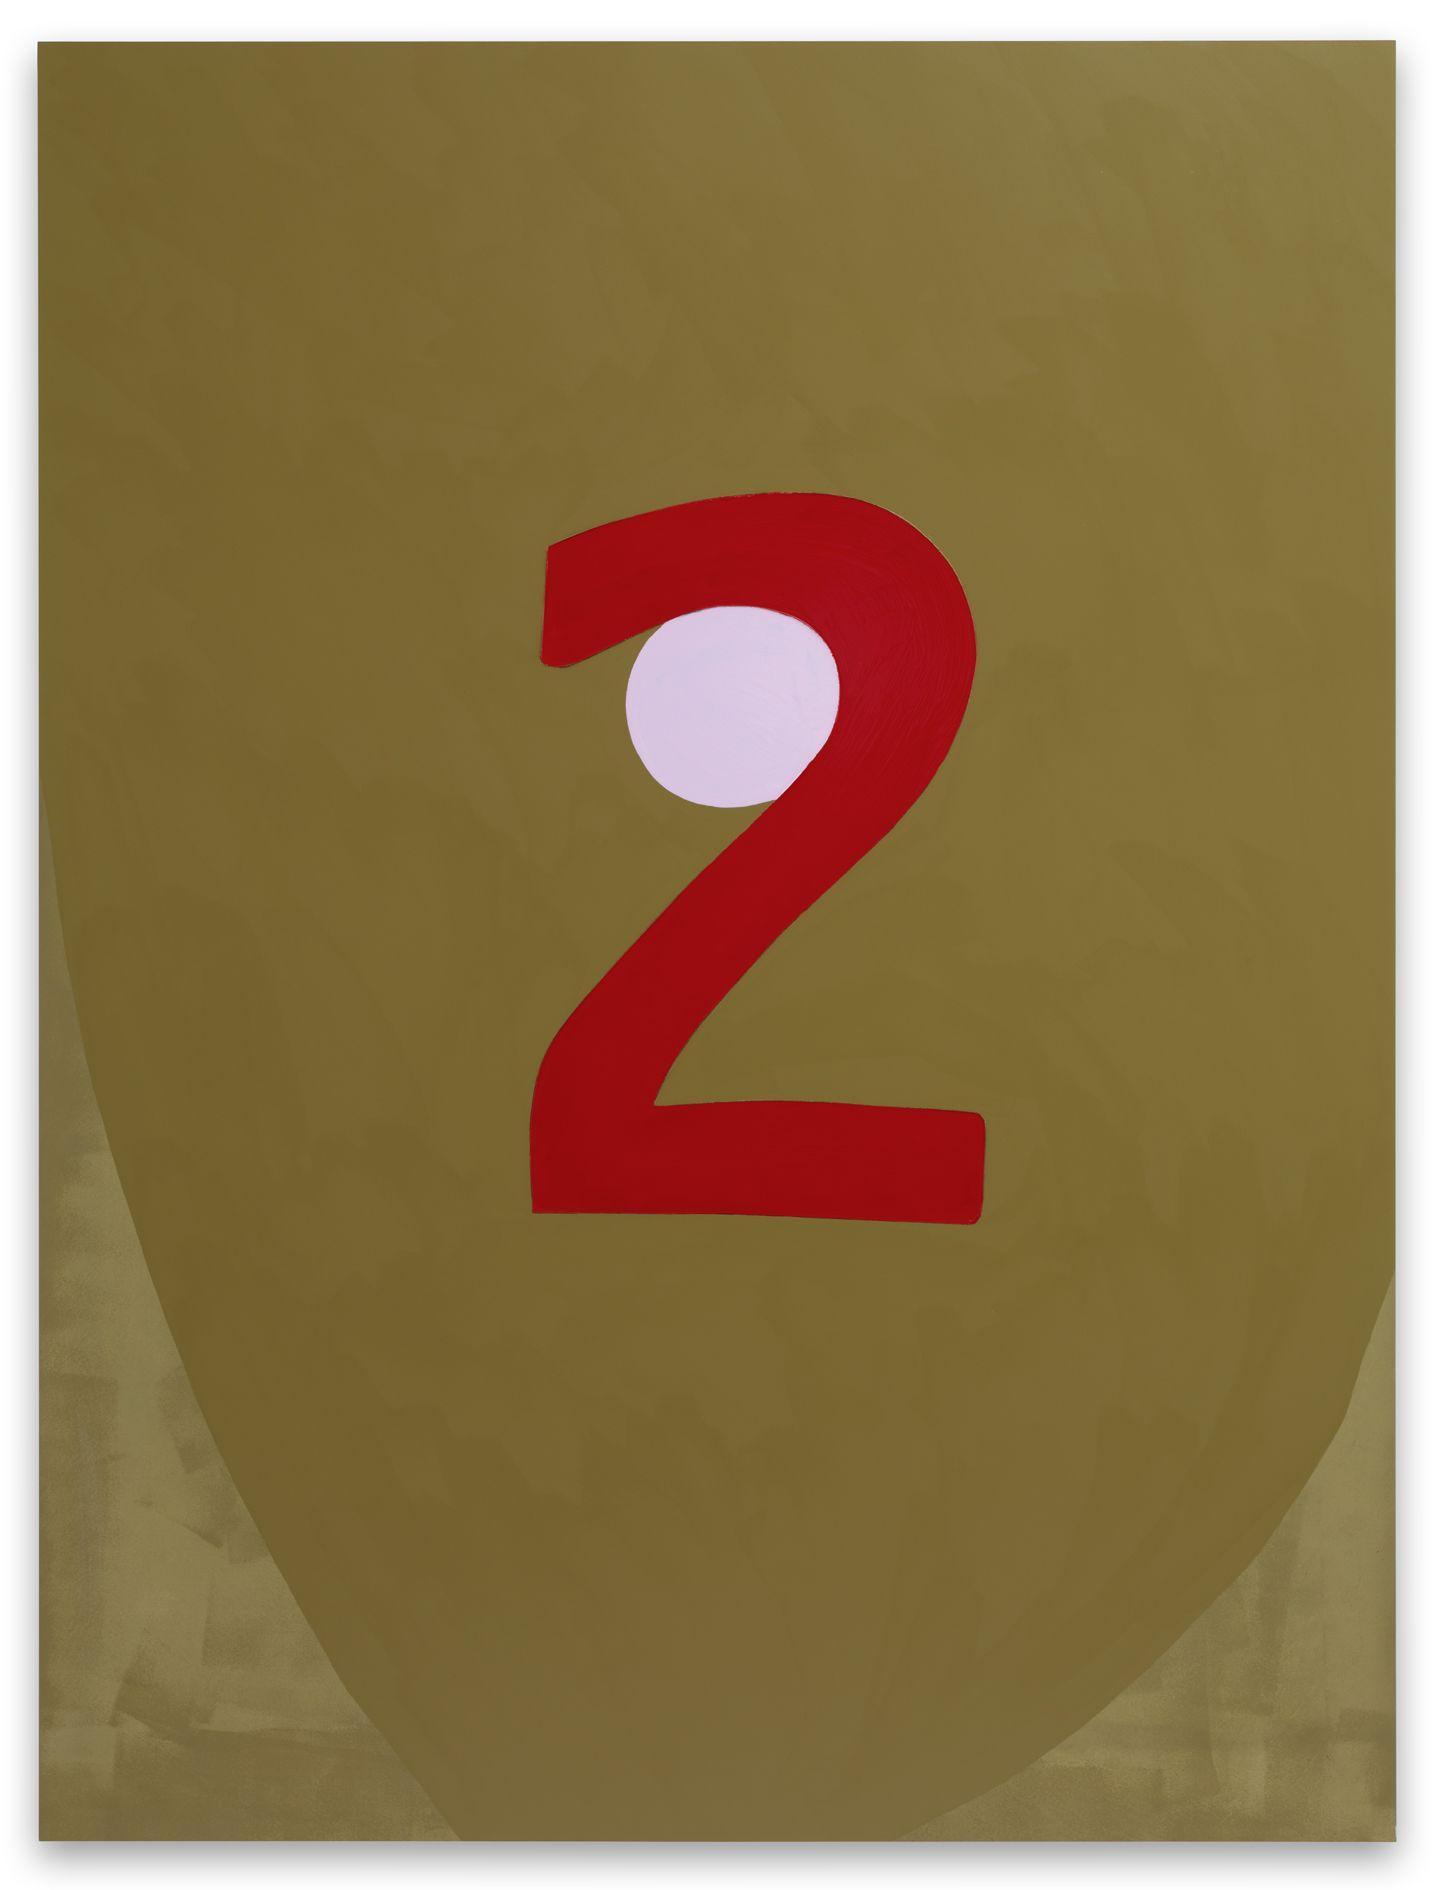 Gary Hume – 2 – Berlin